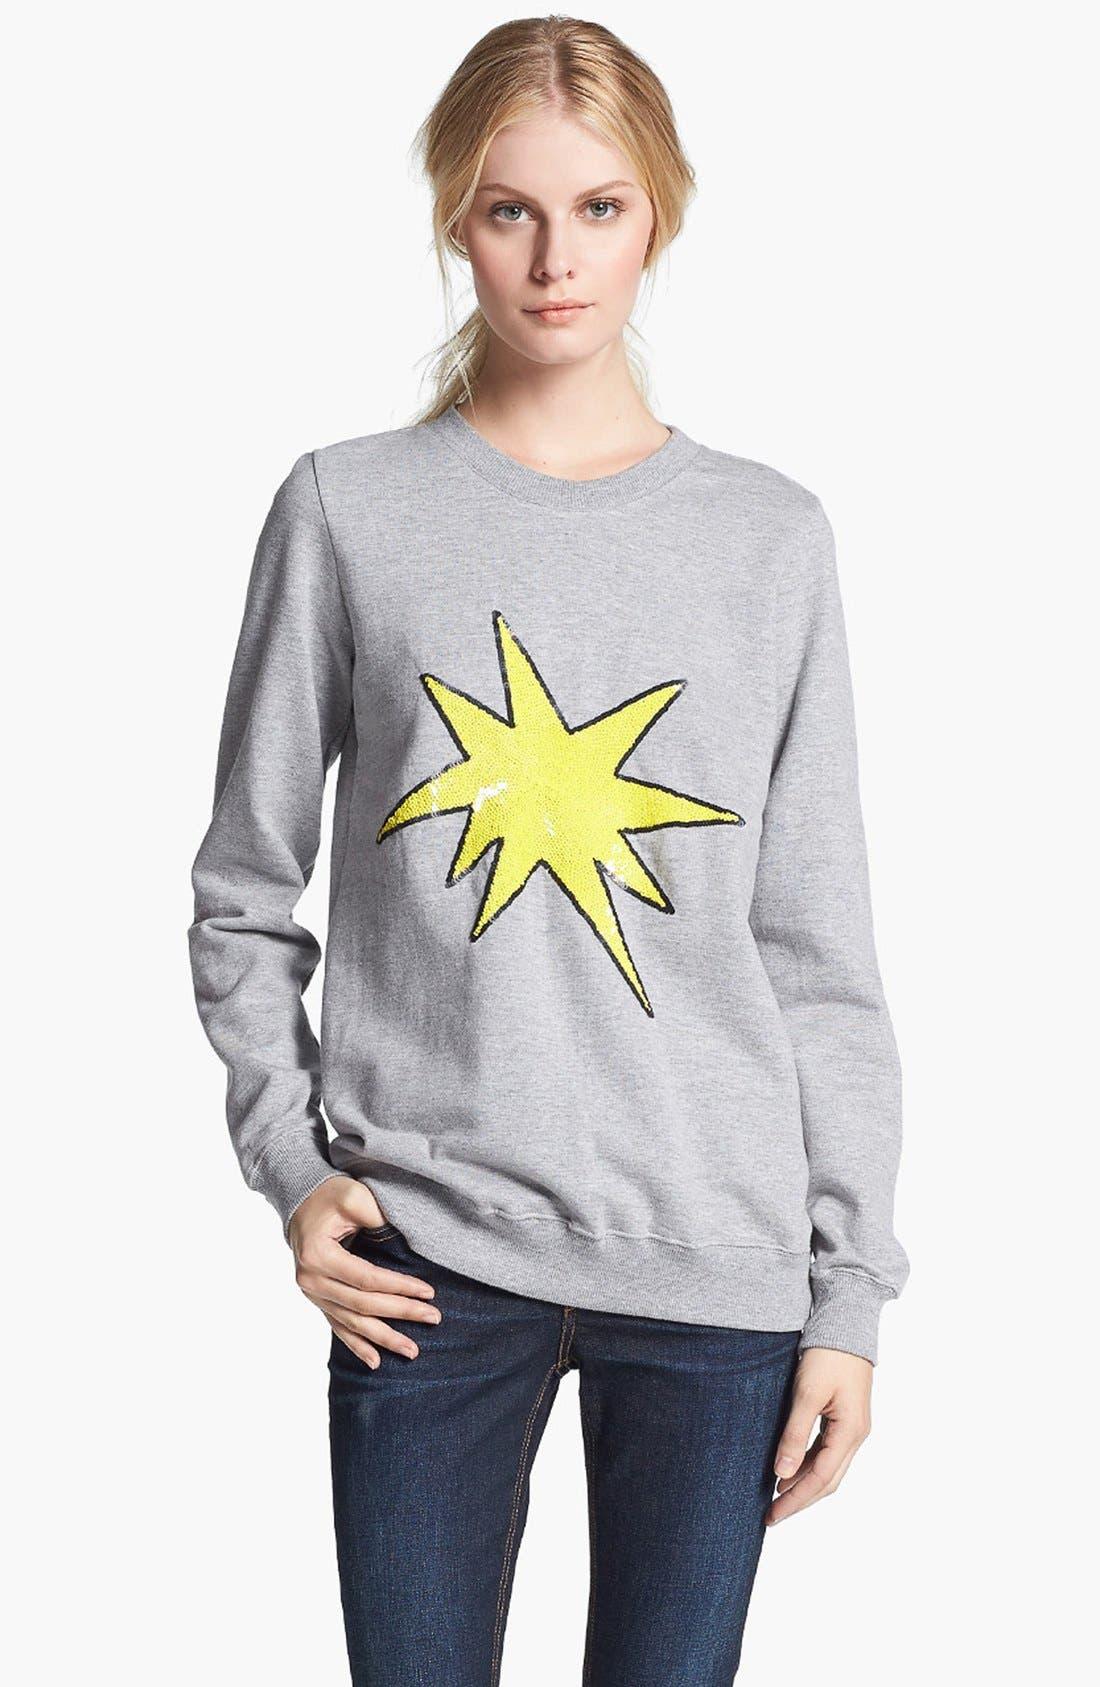 Alternate Image 1 Selected - Markus Lupfer 'Explosive Star' Sweatshirt